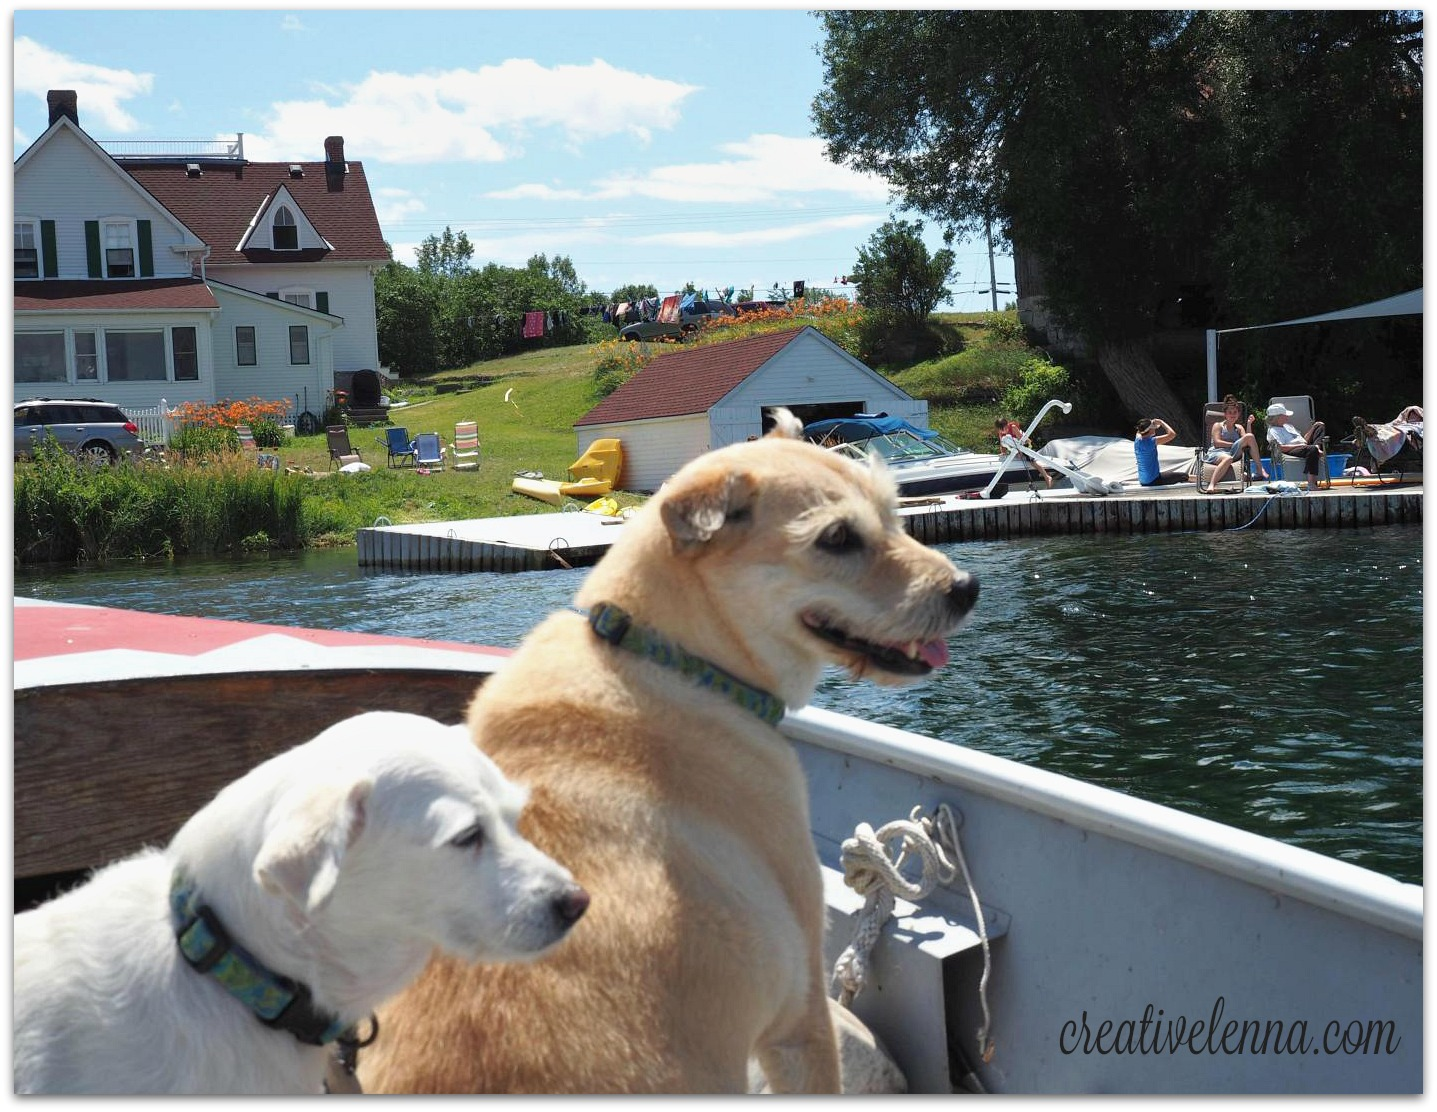 Dogs spy the dock! 2015 in Buzzy